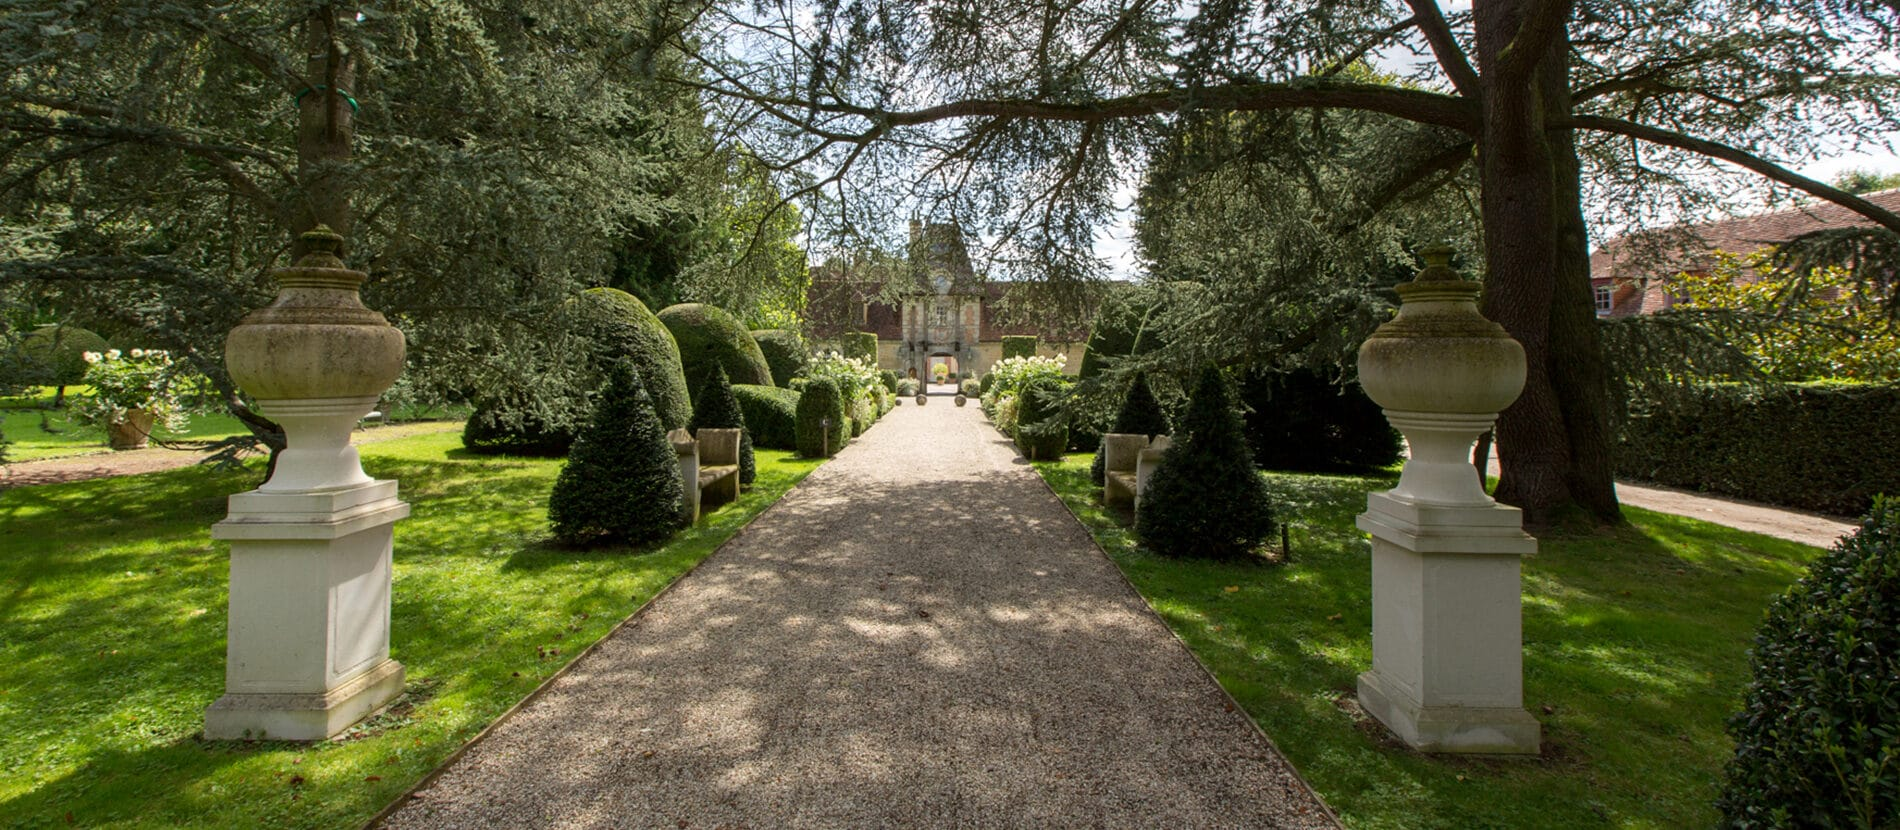 Allée du jardin menant au château